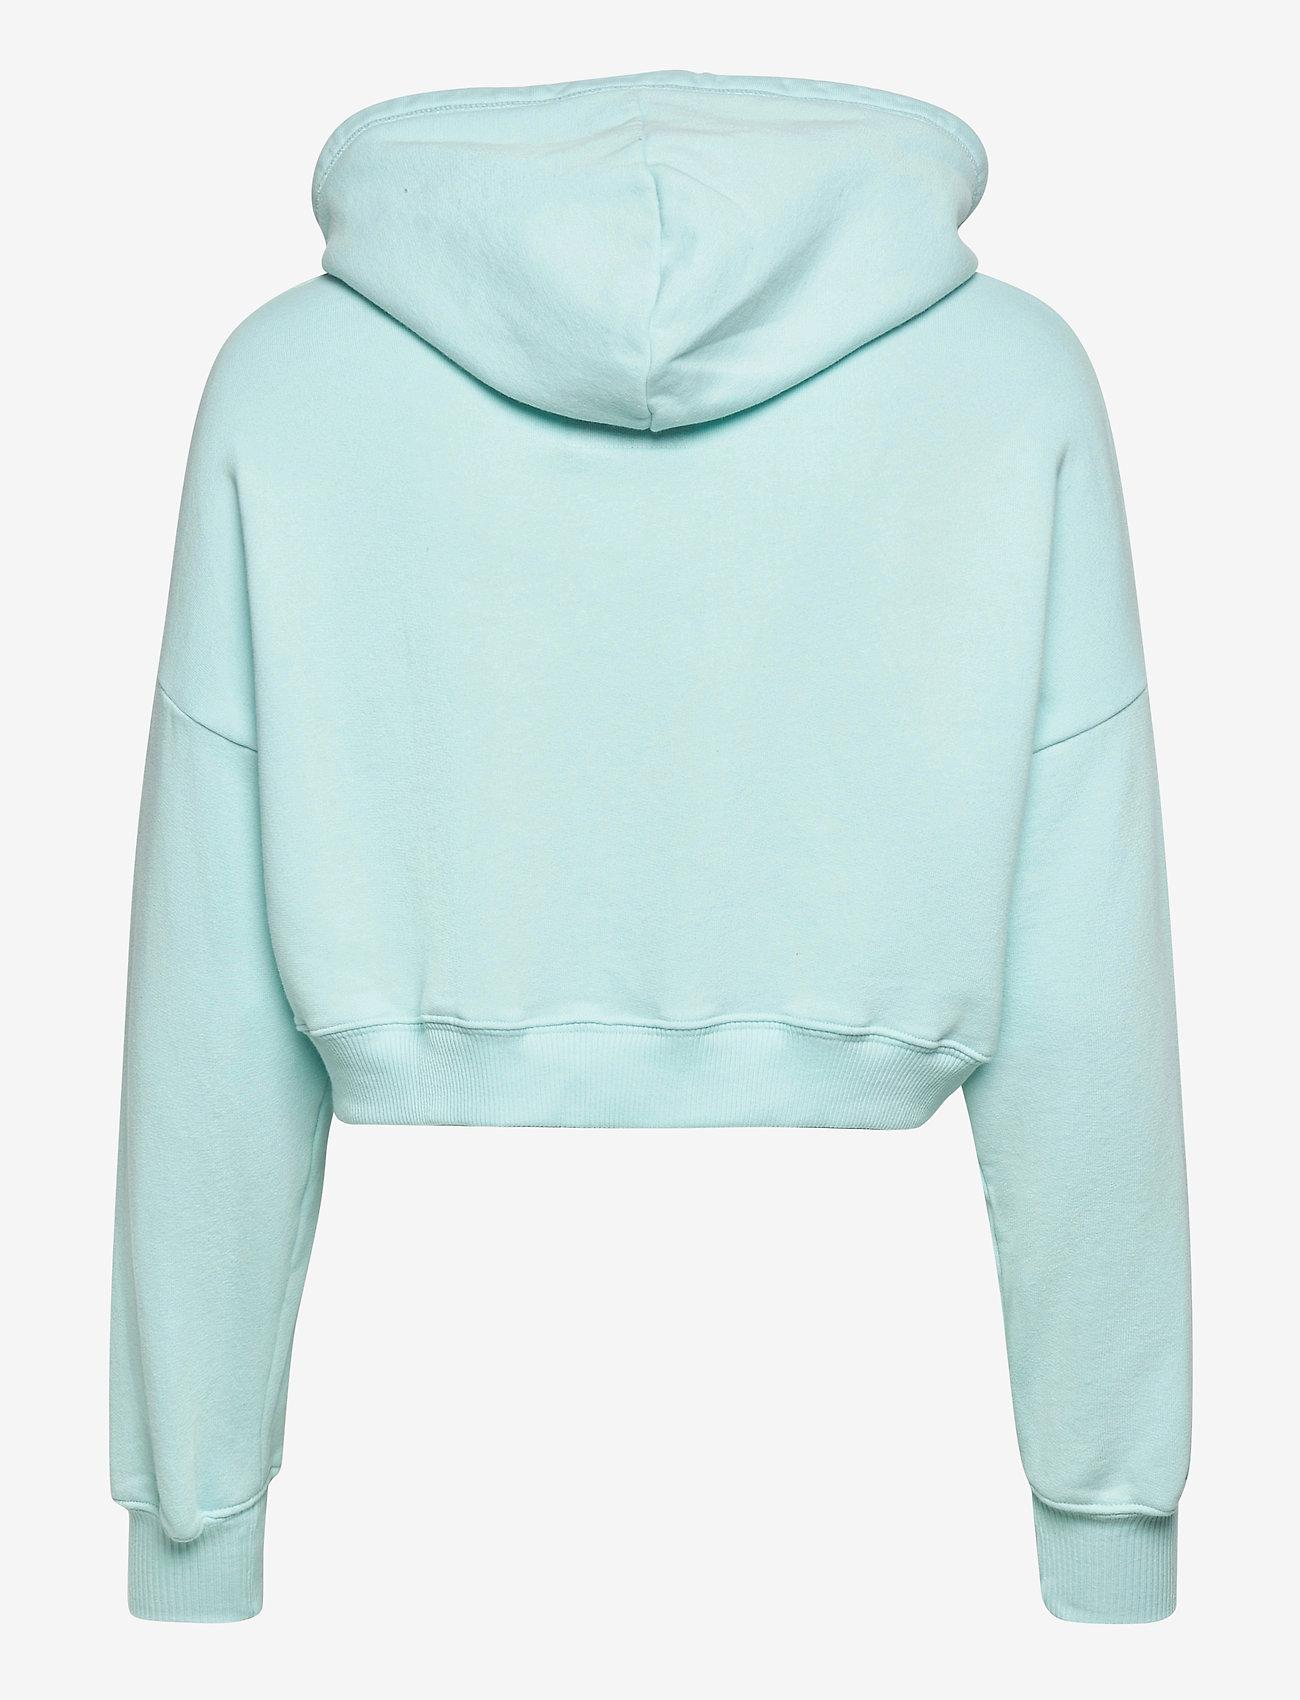 Hollister - HCo. GIRLS SWEATSHIRTS - hættetrøjer - blue - 1